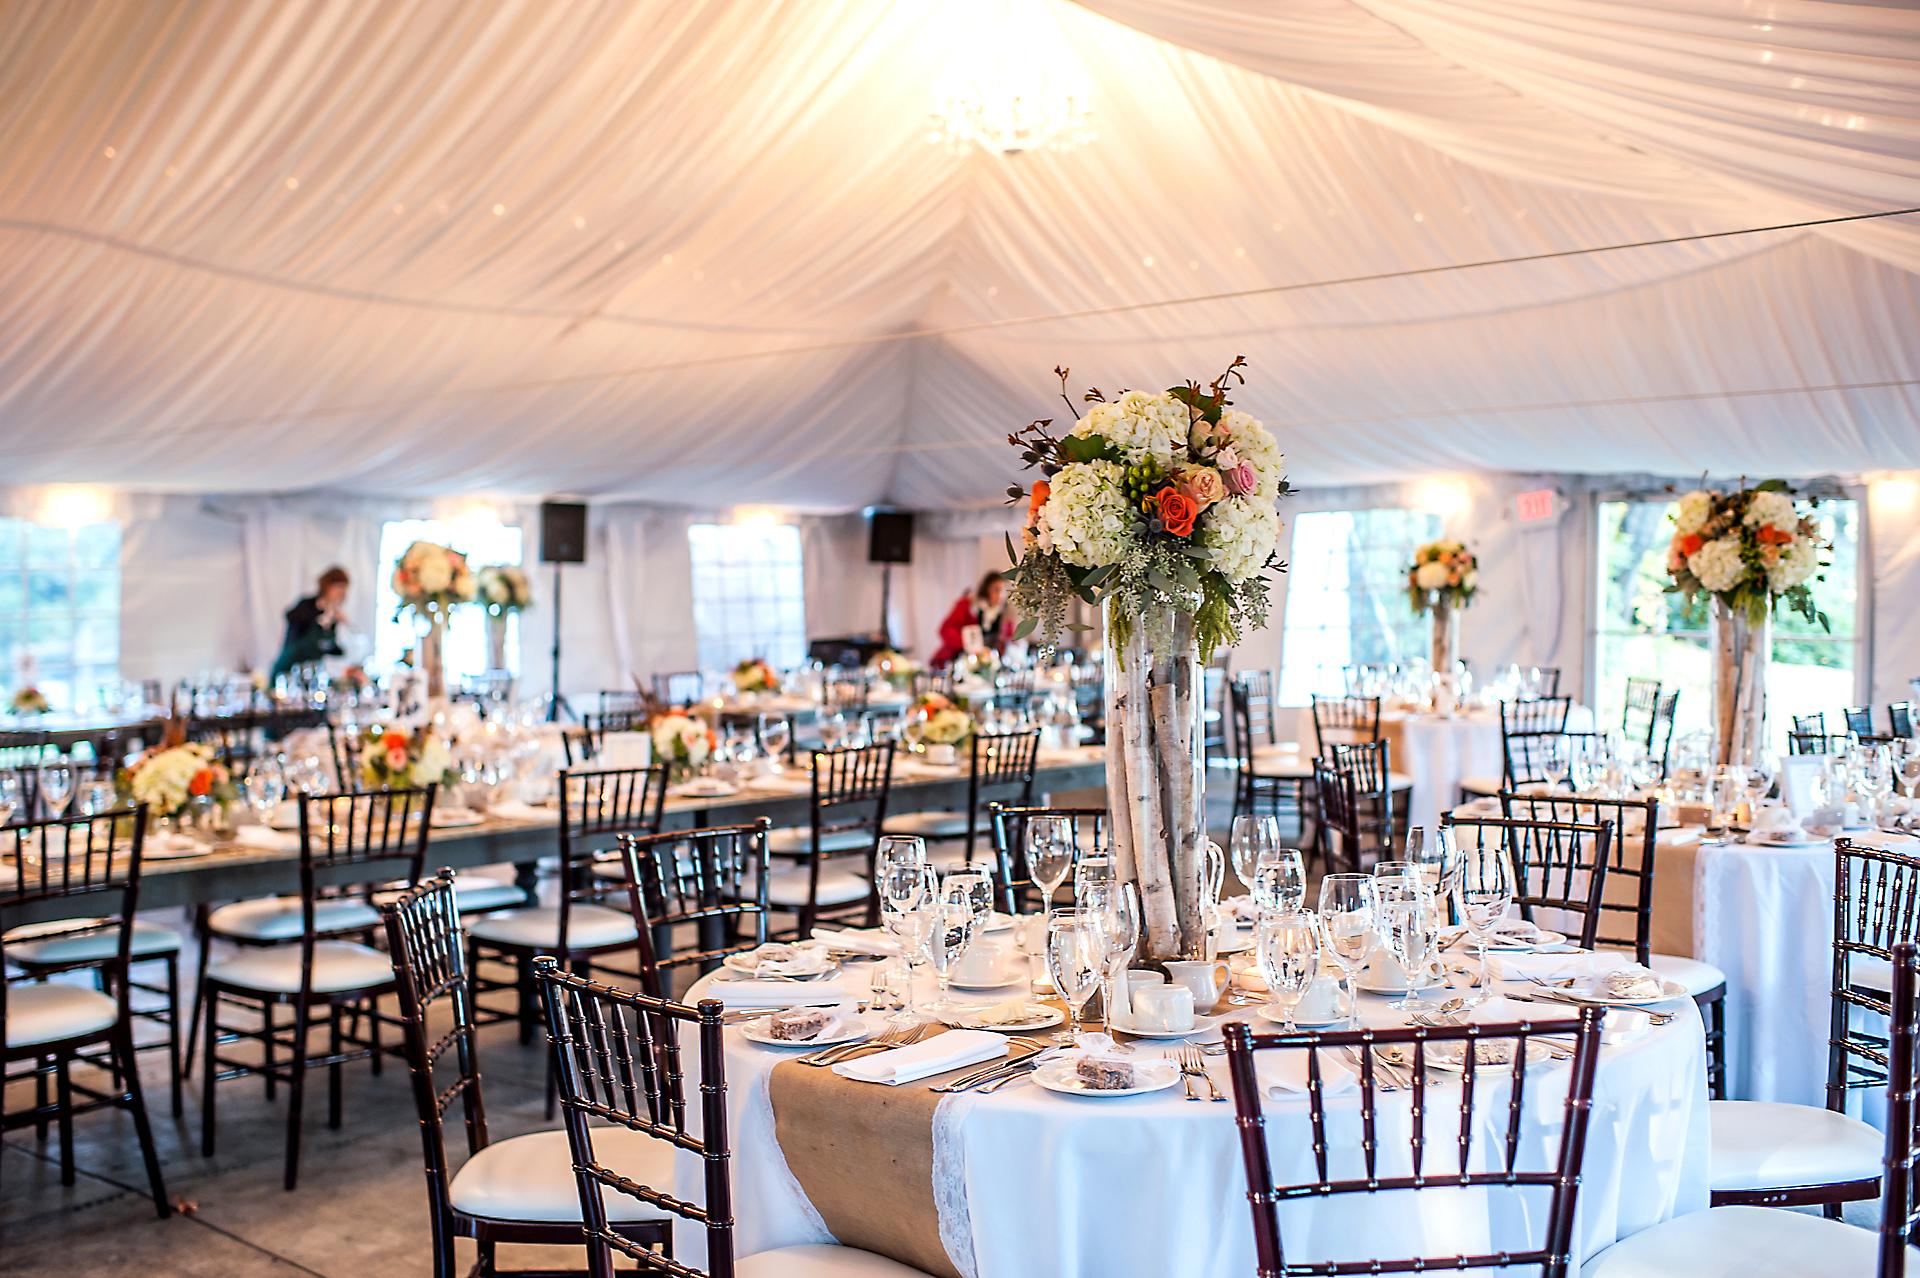 Nathan & Linda | Brooksfield Farms Wedding | Muskoka Wedding Photography33